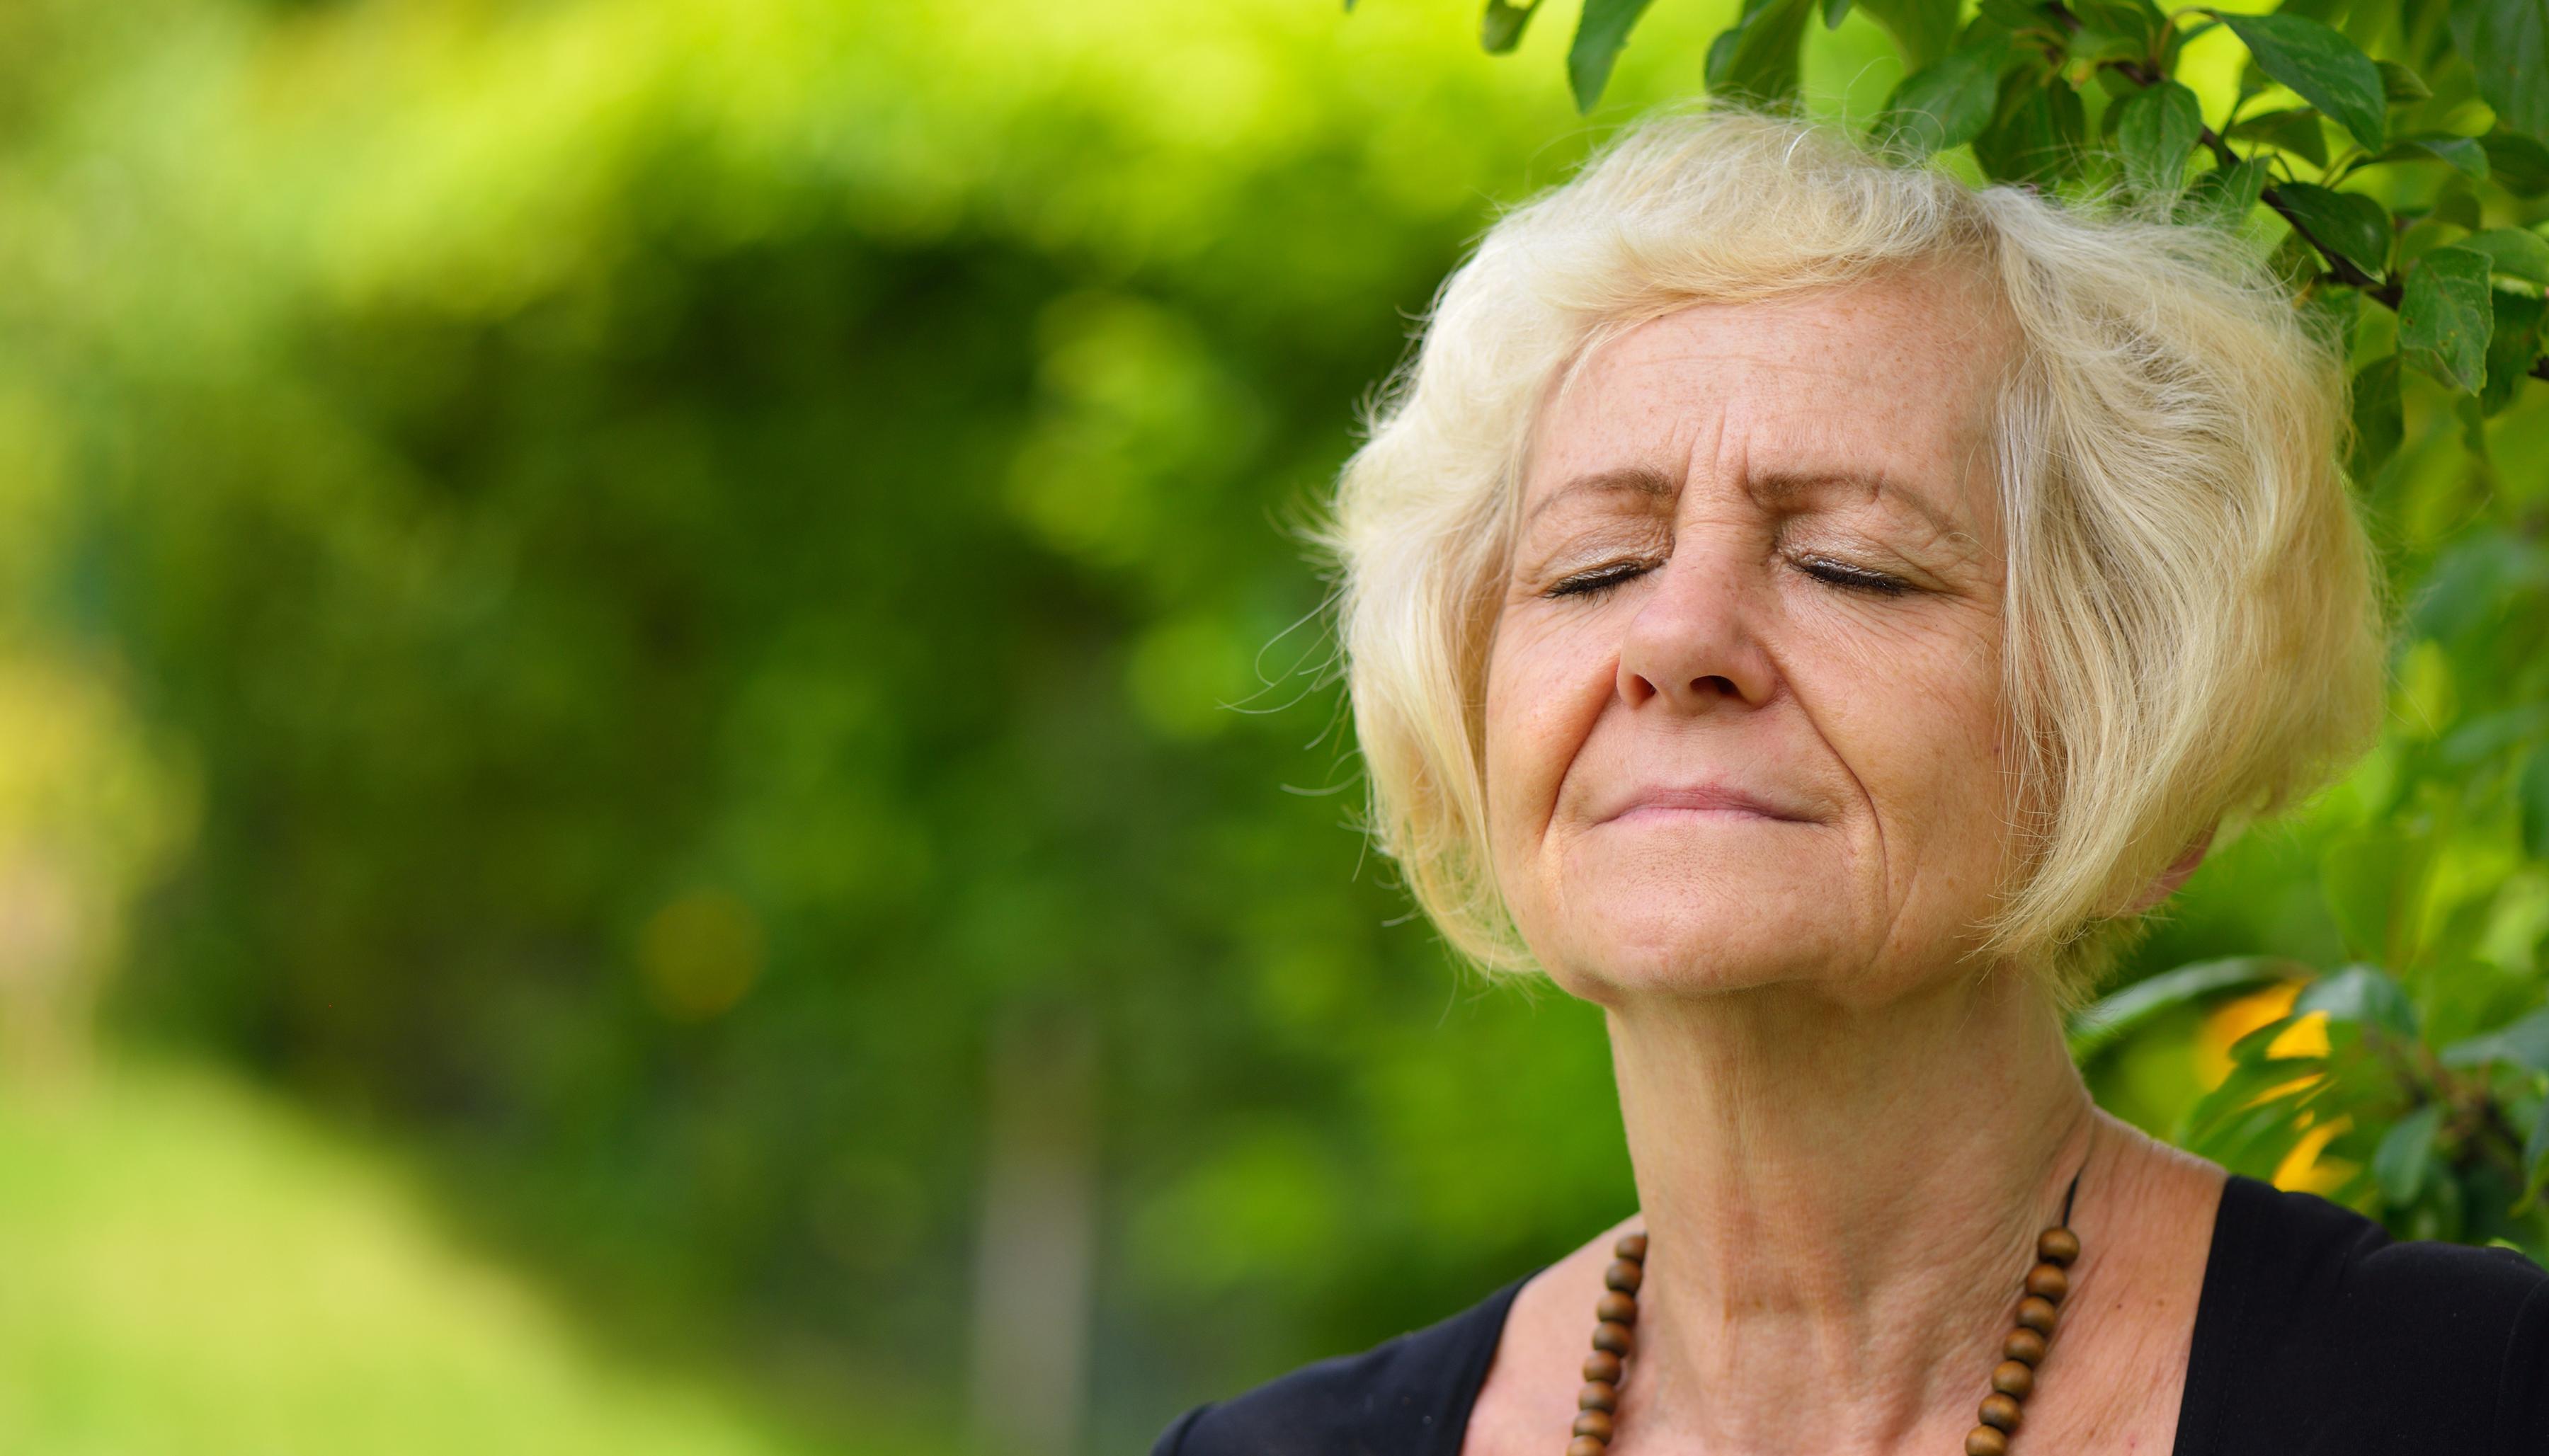 menopause-image